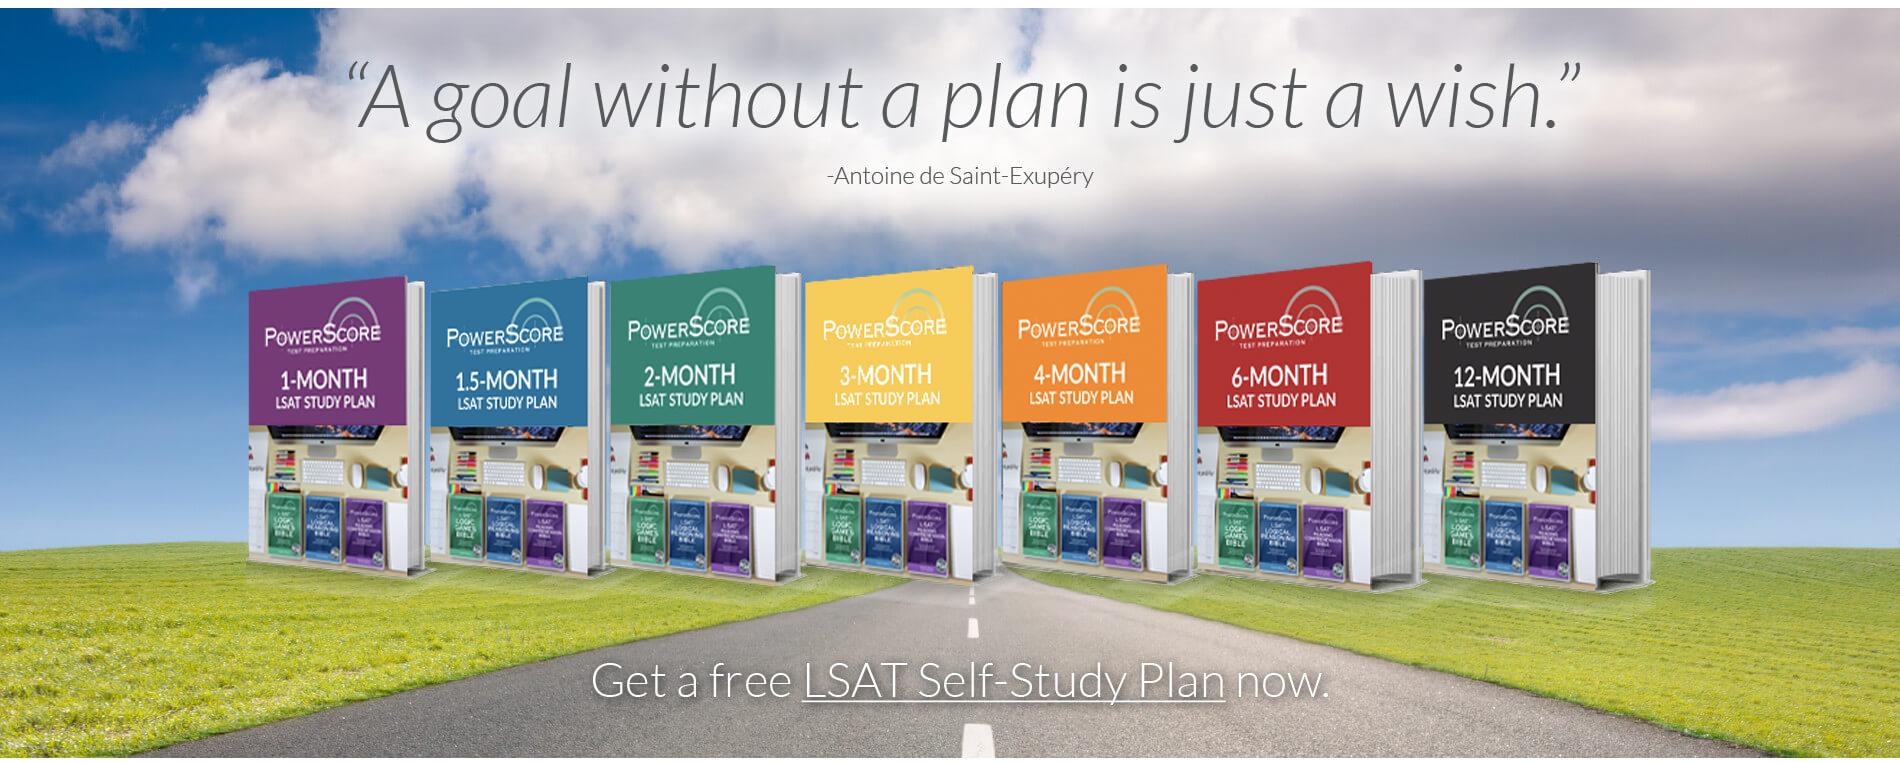 self-study plans banner